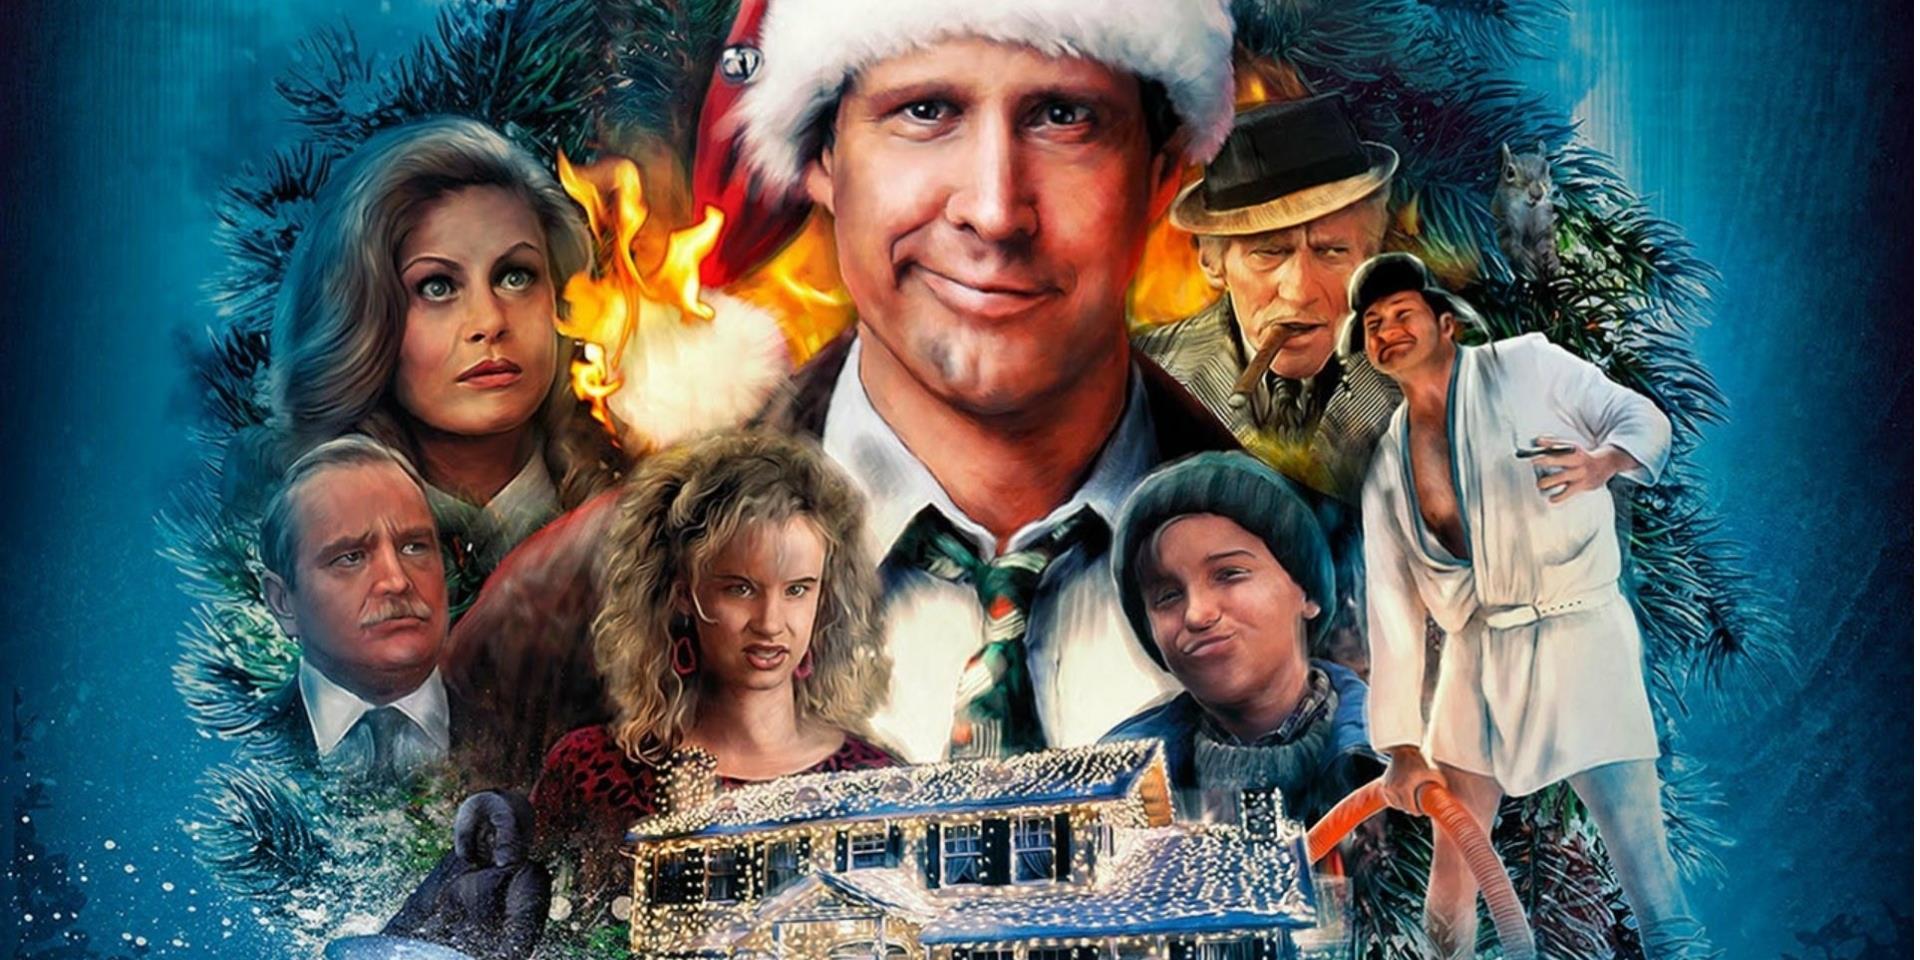 NATIONAL LAMPOON'S CHRISTMAS VACATION - Carolina Classic Holiday Movie